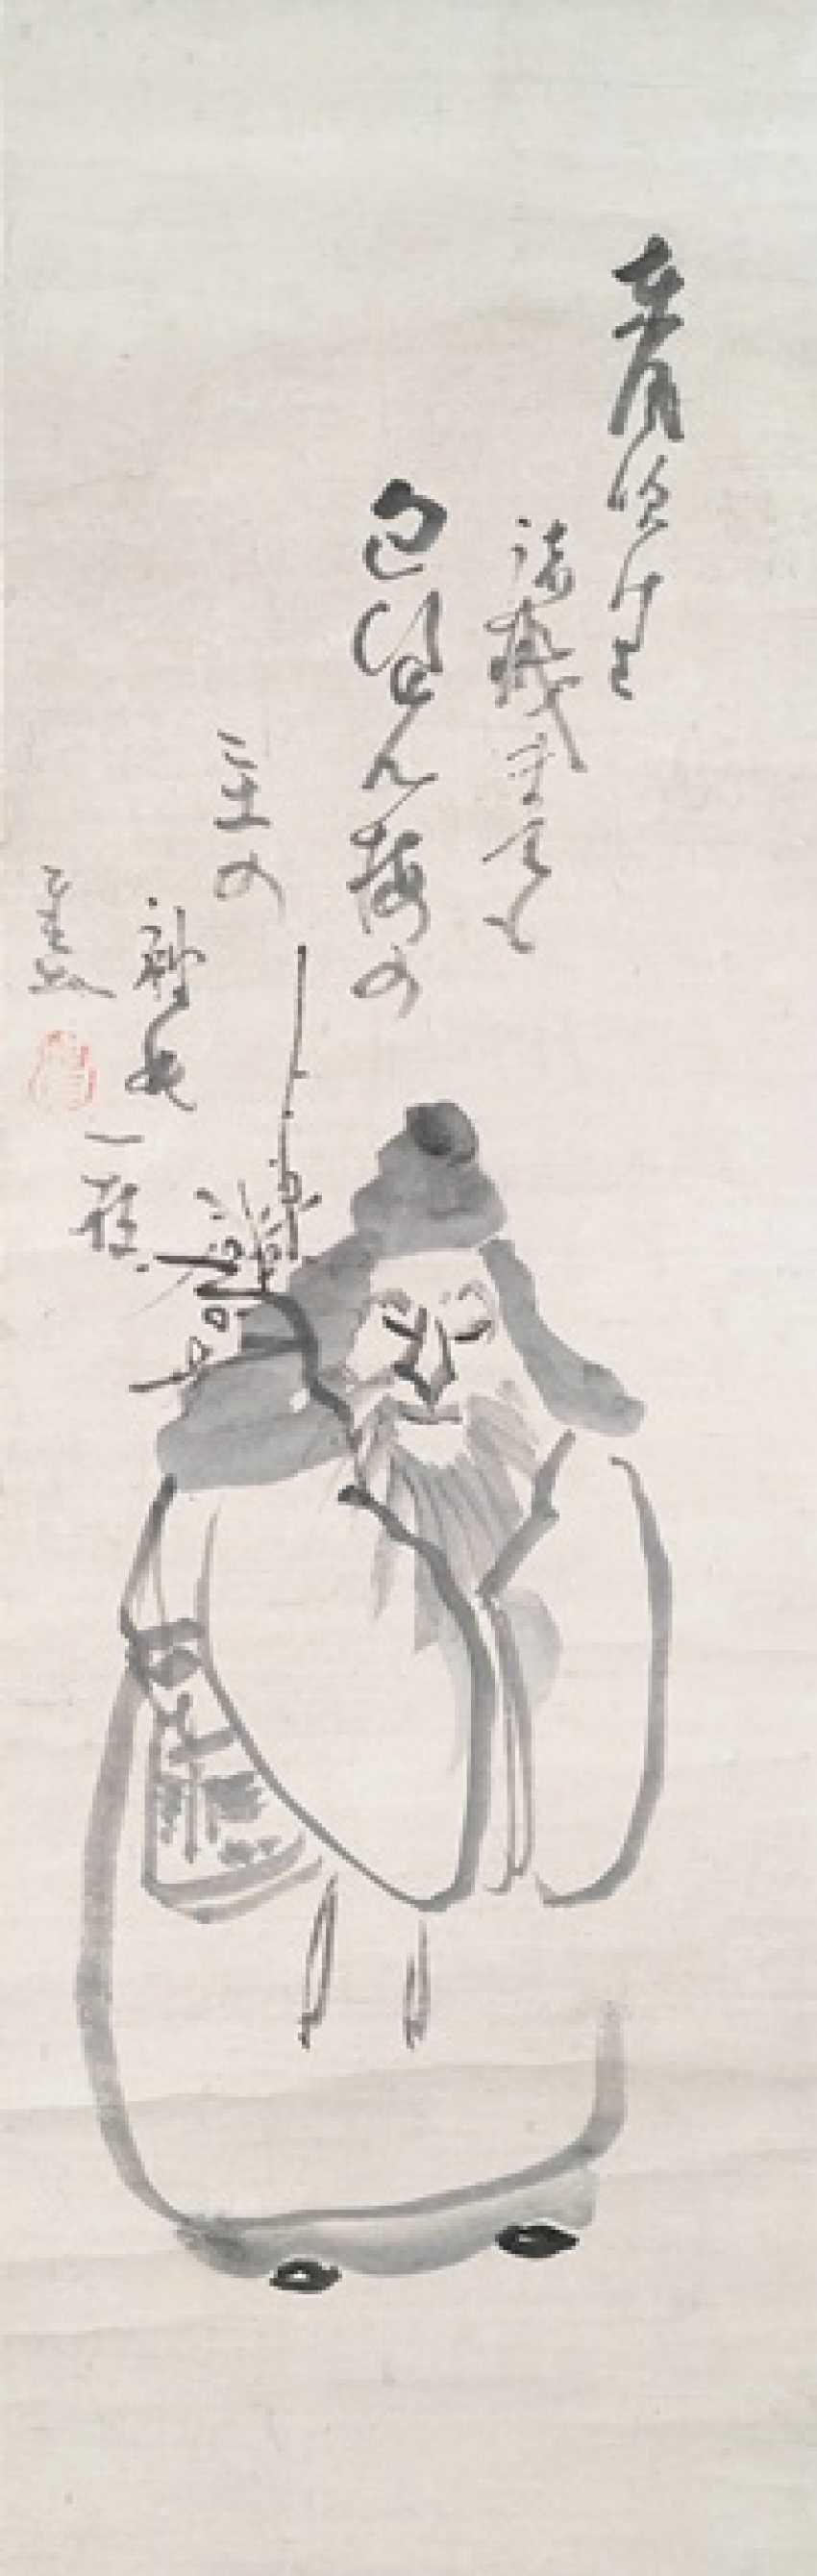 Gibon Sengai attr. - photo 1